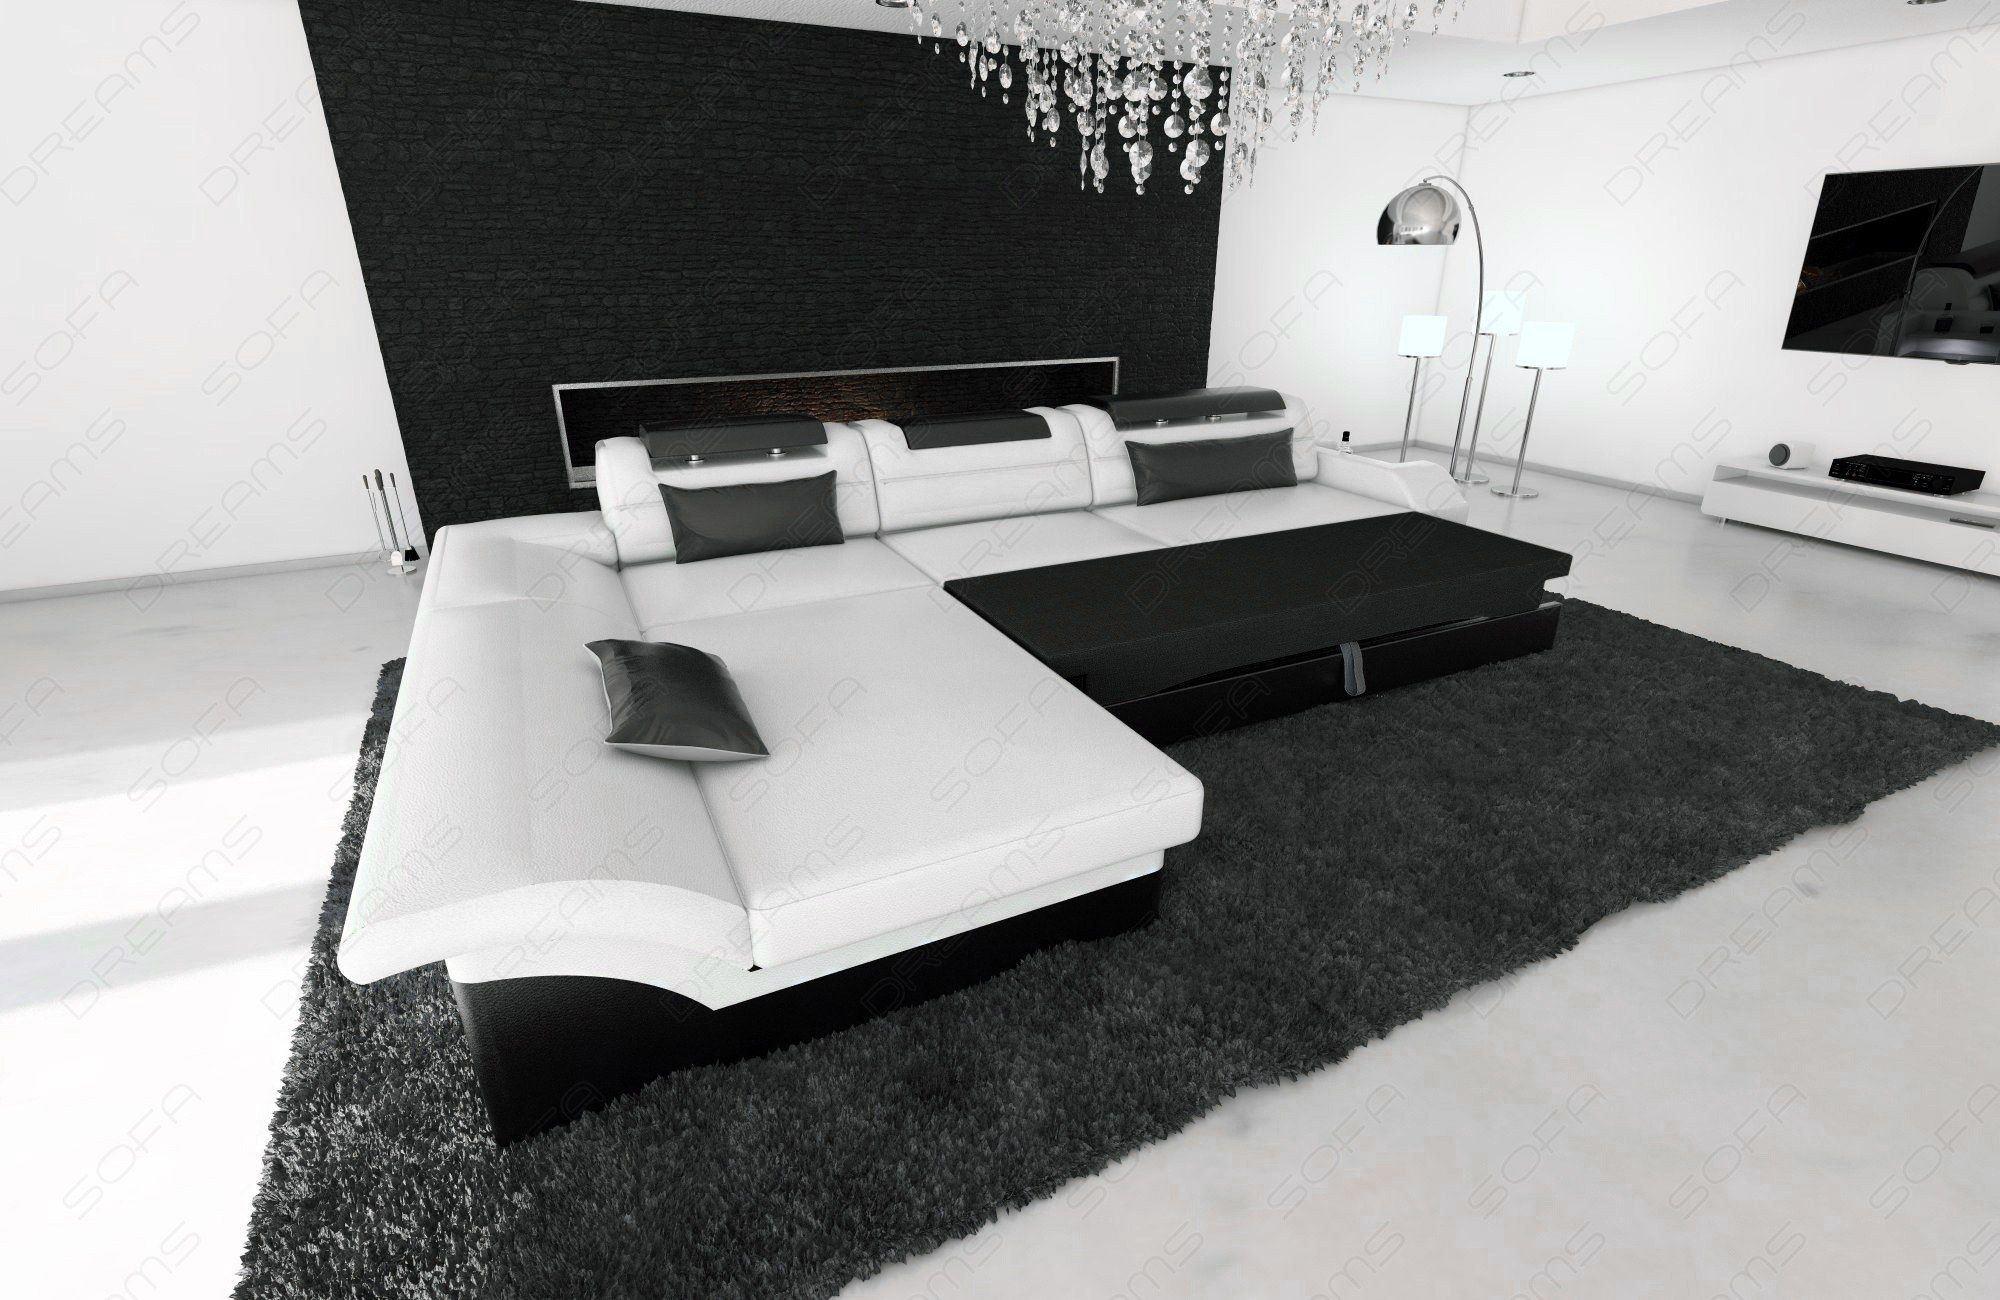 sofas ledersofa stoff couch monza l form mit led beleuchtung stoffsofas g nstig online kaufen. Black Bedroom Furniture Sets. Home Design Ideas